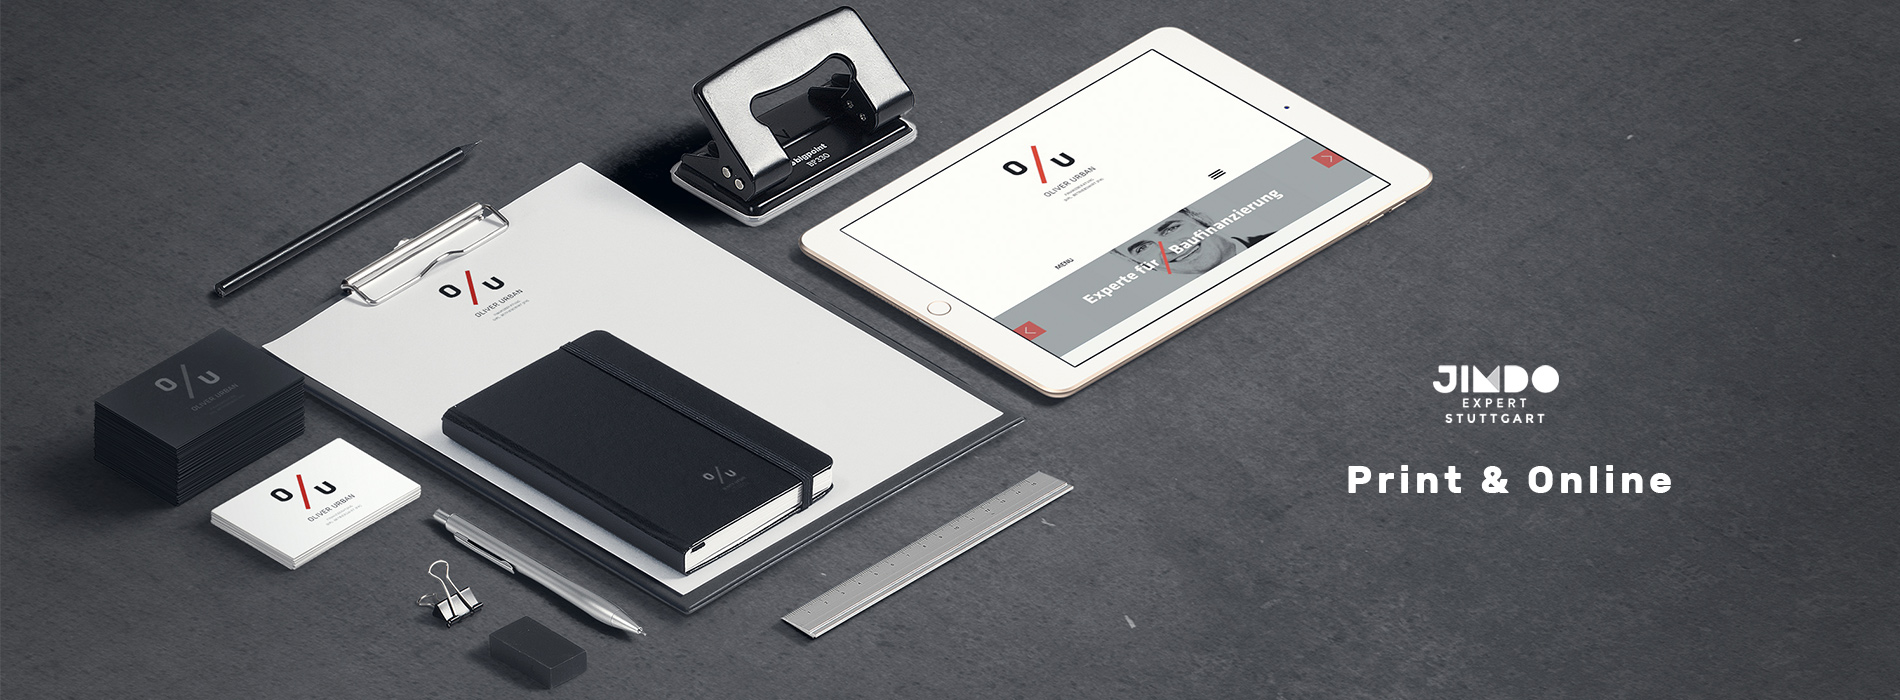 Jimdo Expert Stuttgart - Webdesign, Print & Online, Responsive Design - Peter Scheerer